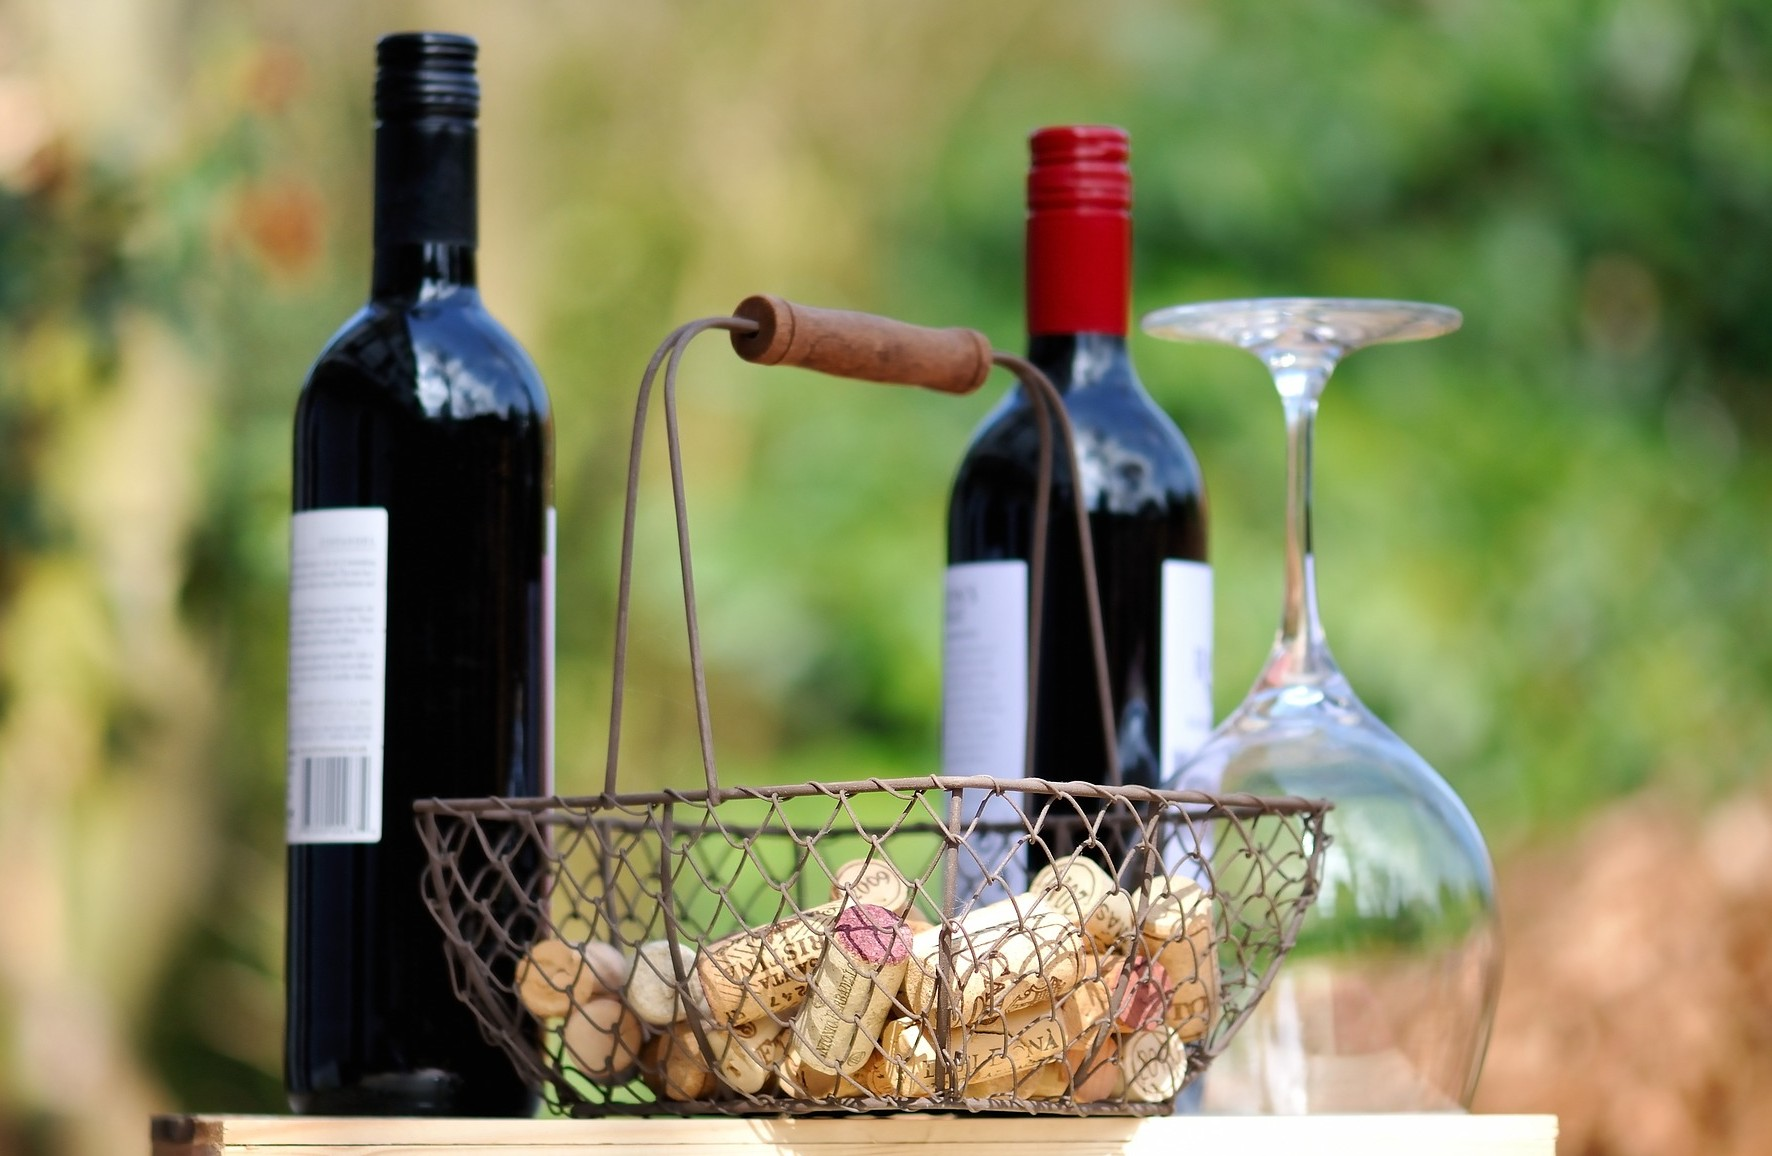 Discovering Umbria wines in Orvieto